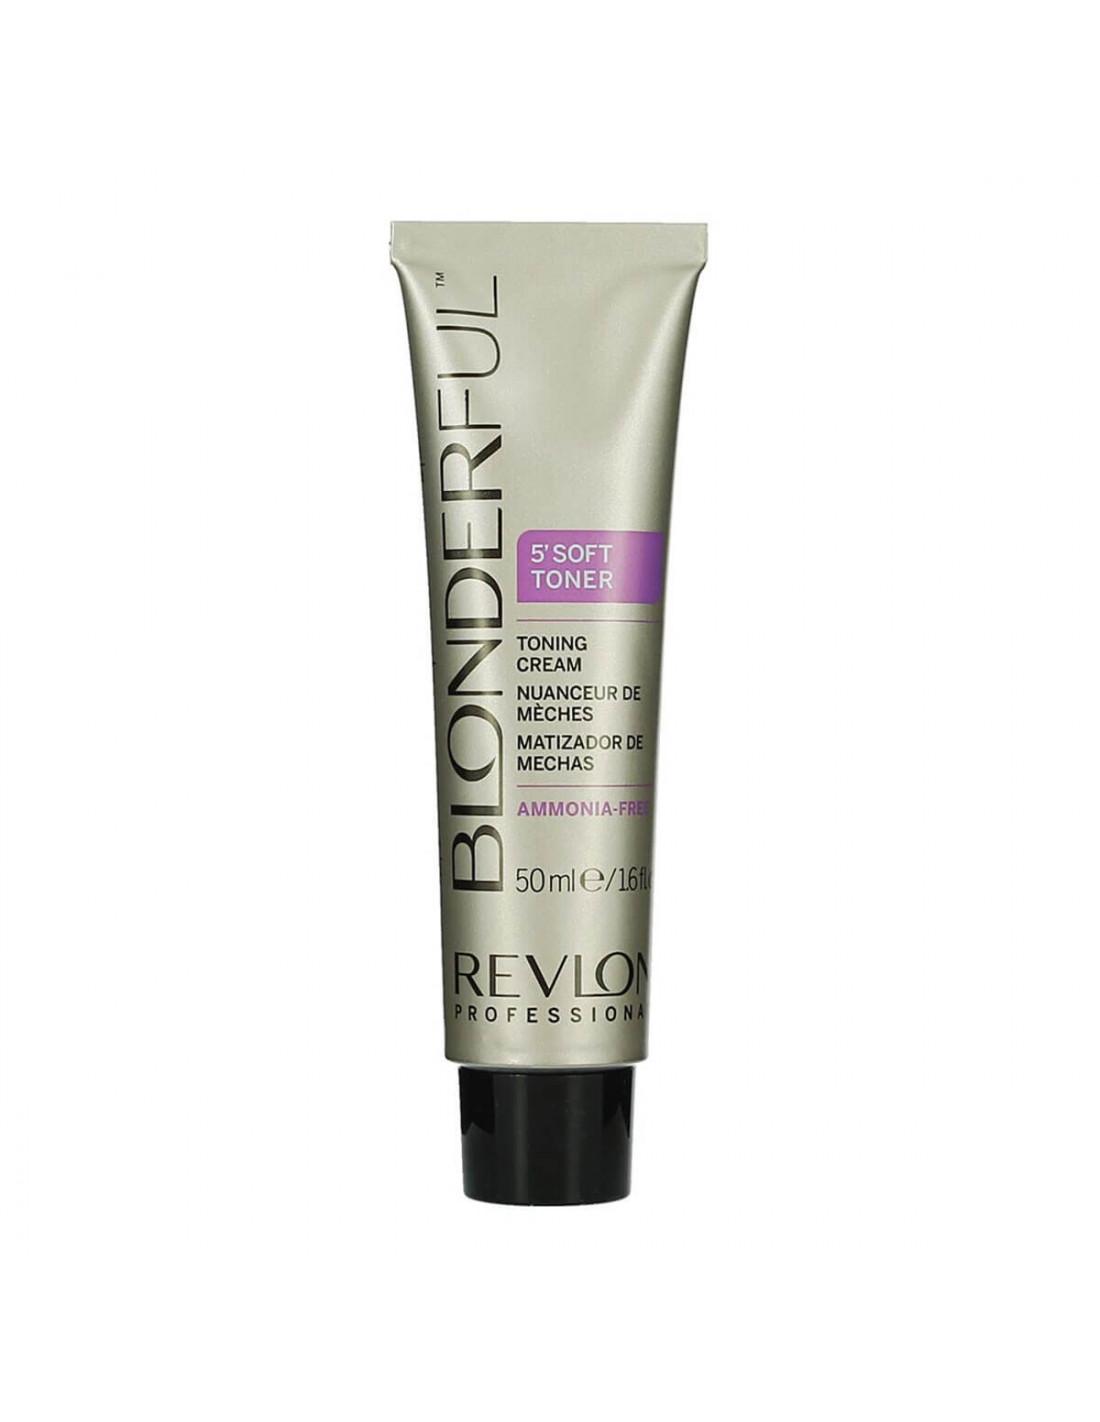 Revlon Professional Blonderful Soft Toner 50 ml - Fashion Beauty Shop dc73a5a31bfe